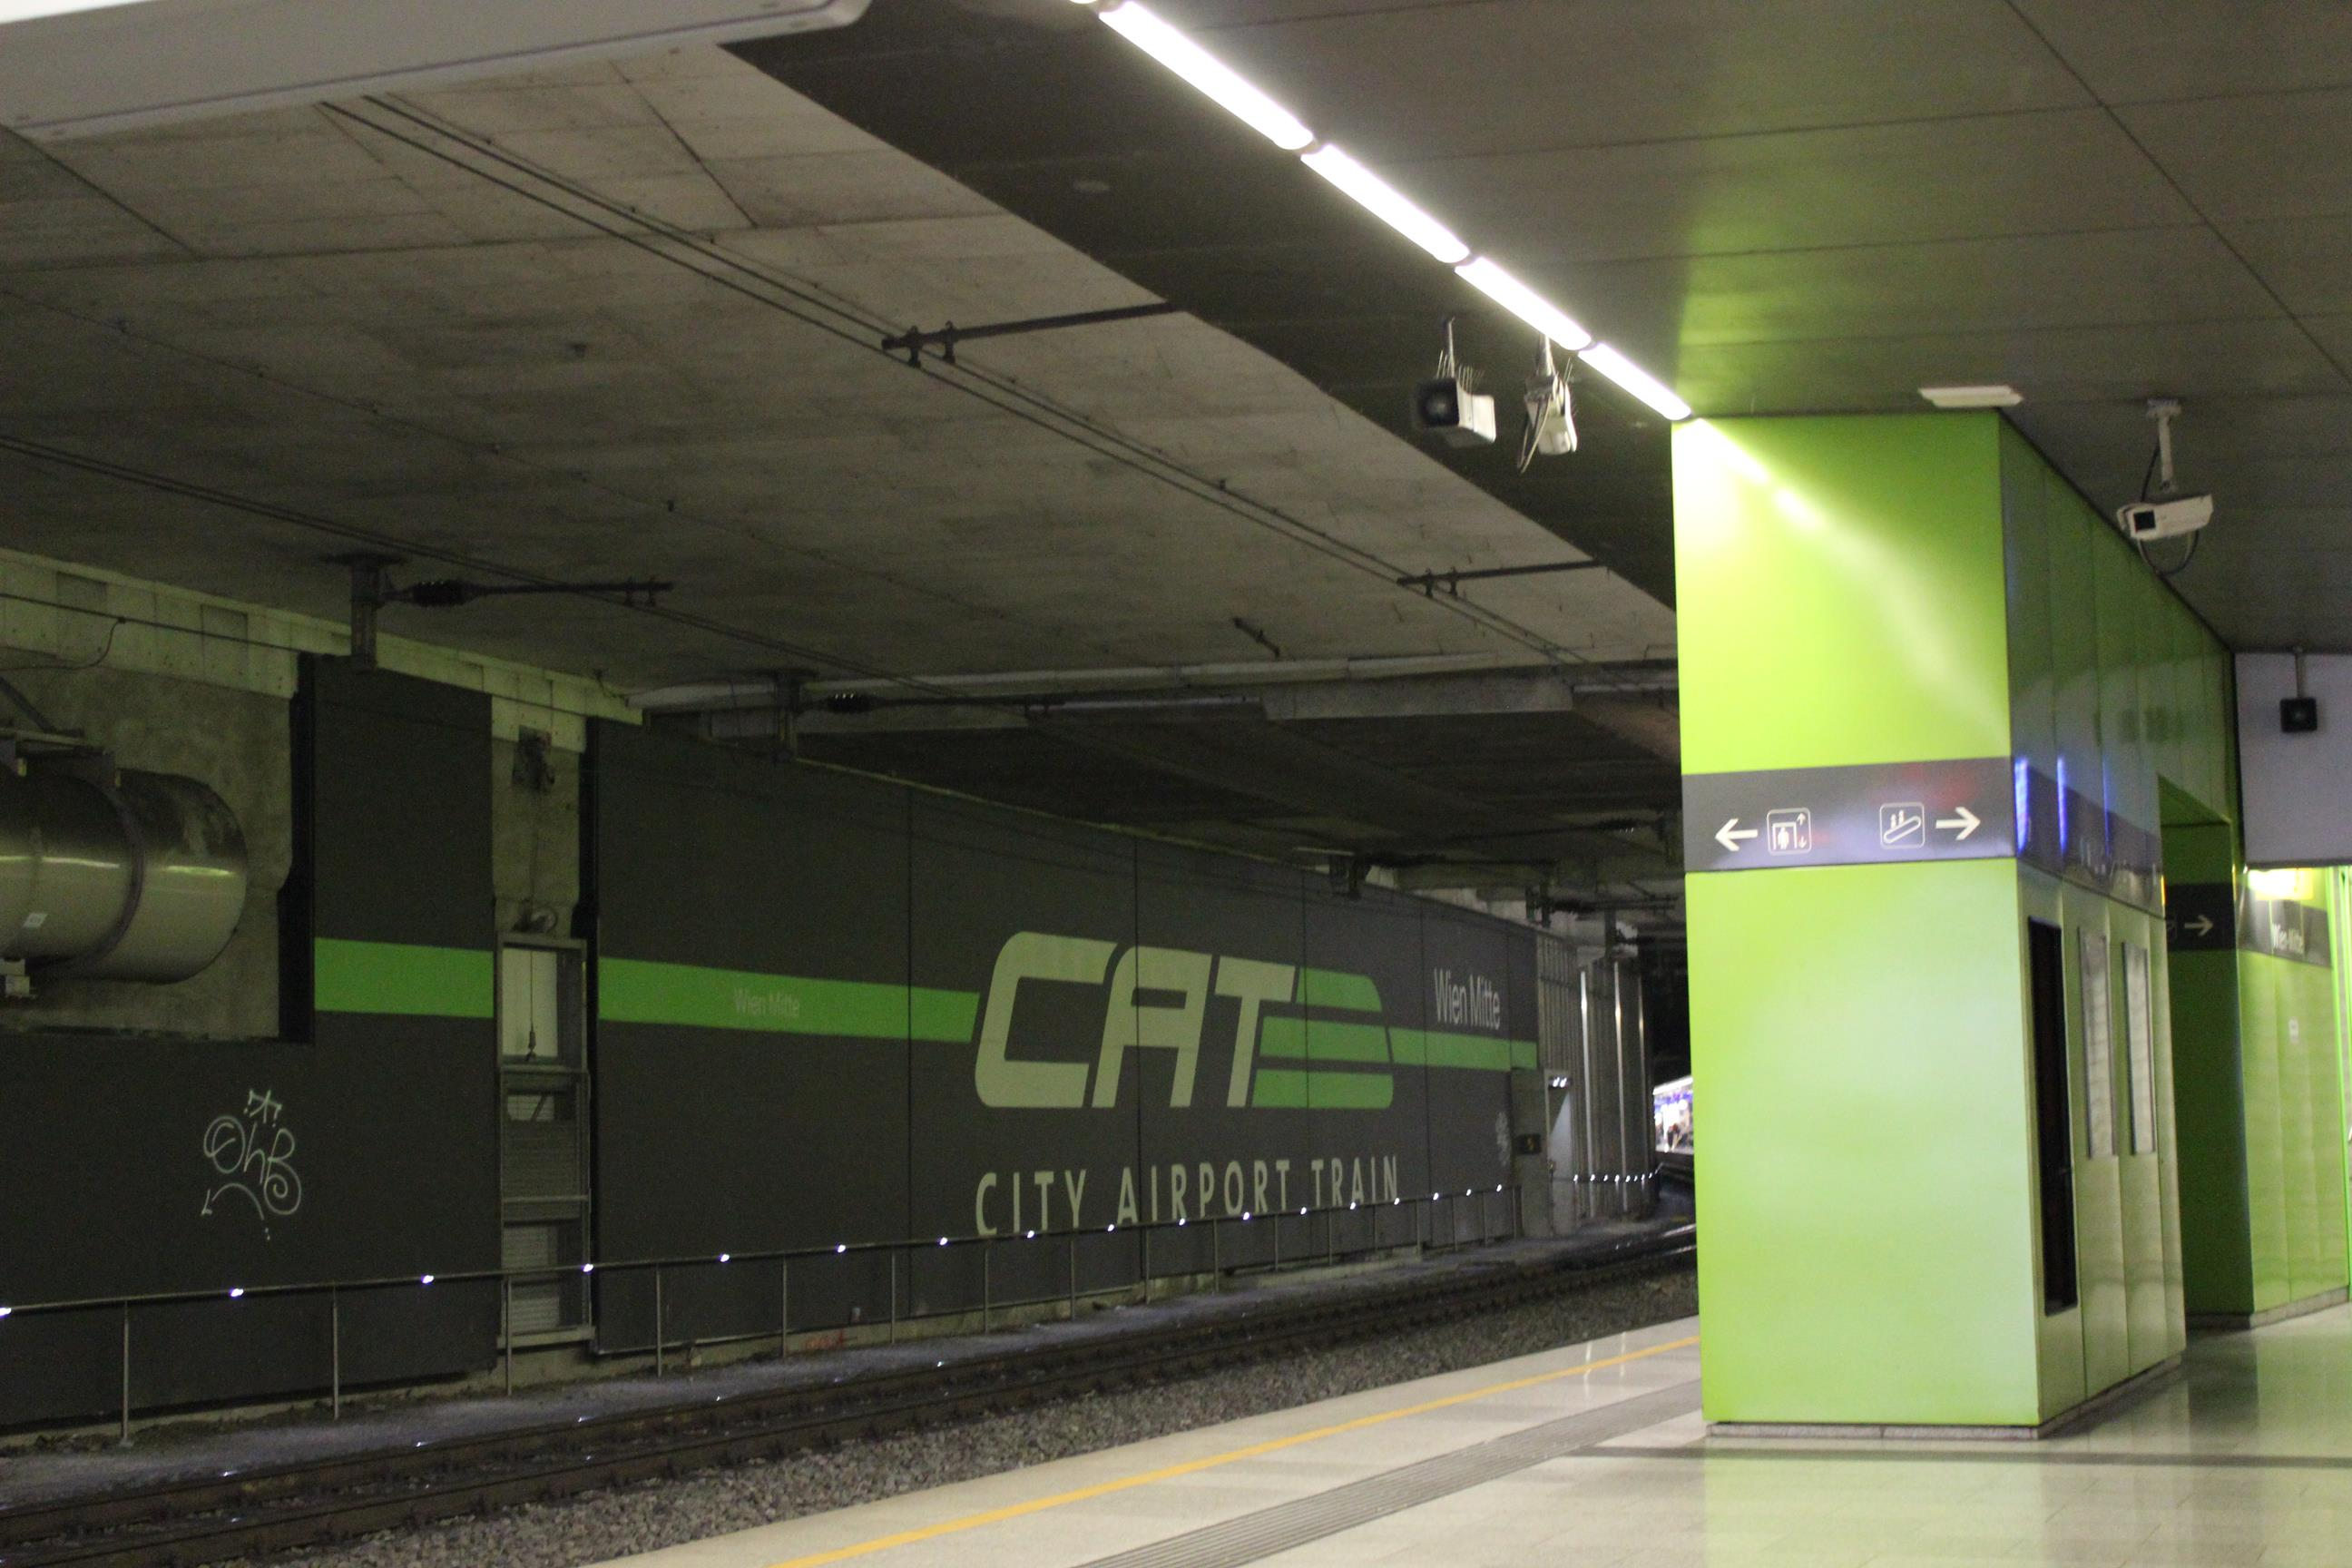 CAT city airport train